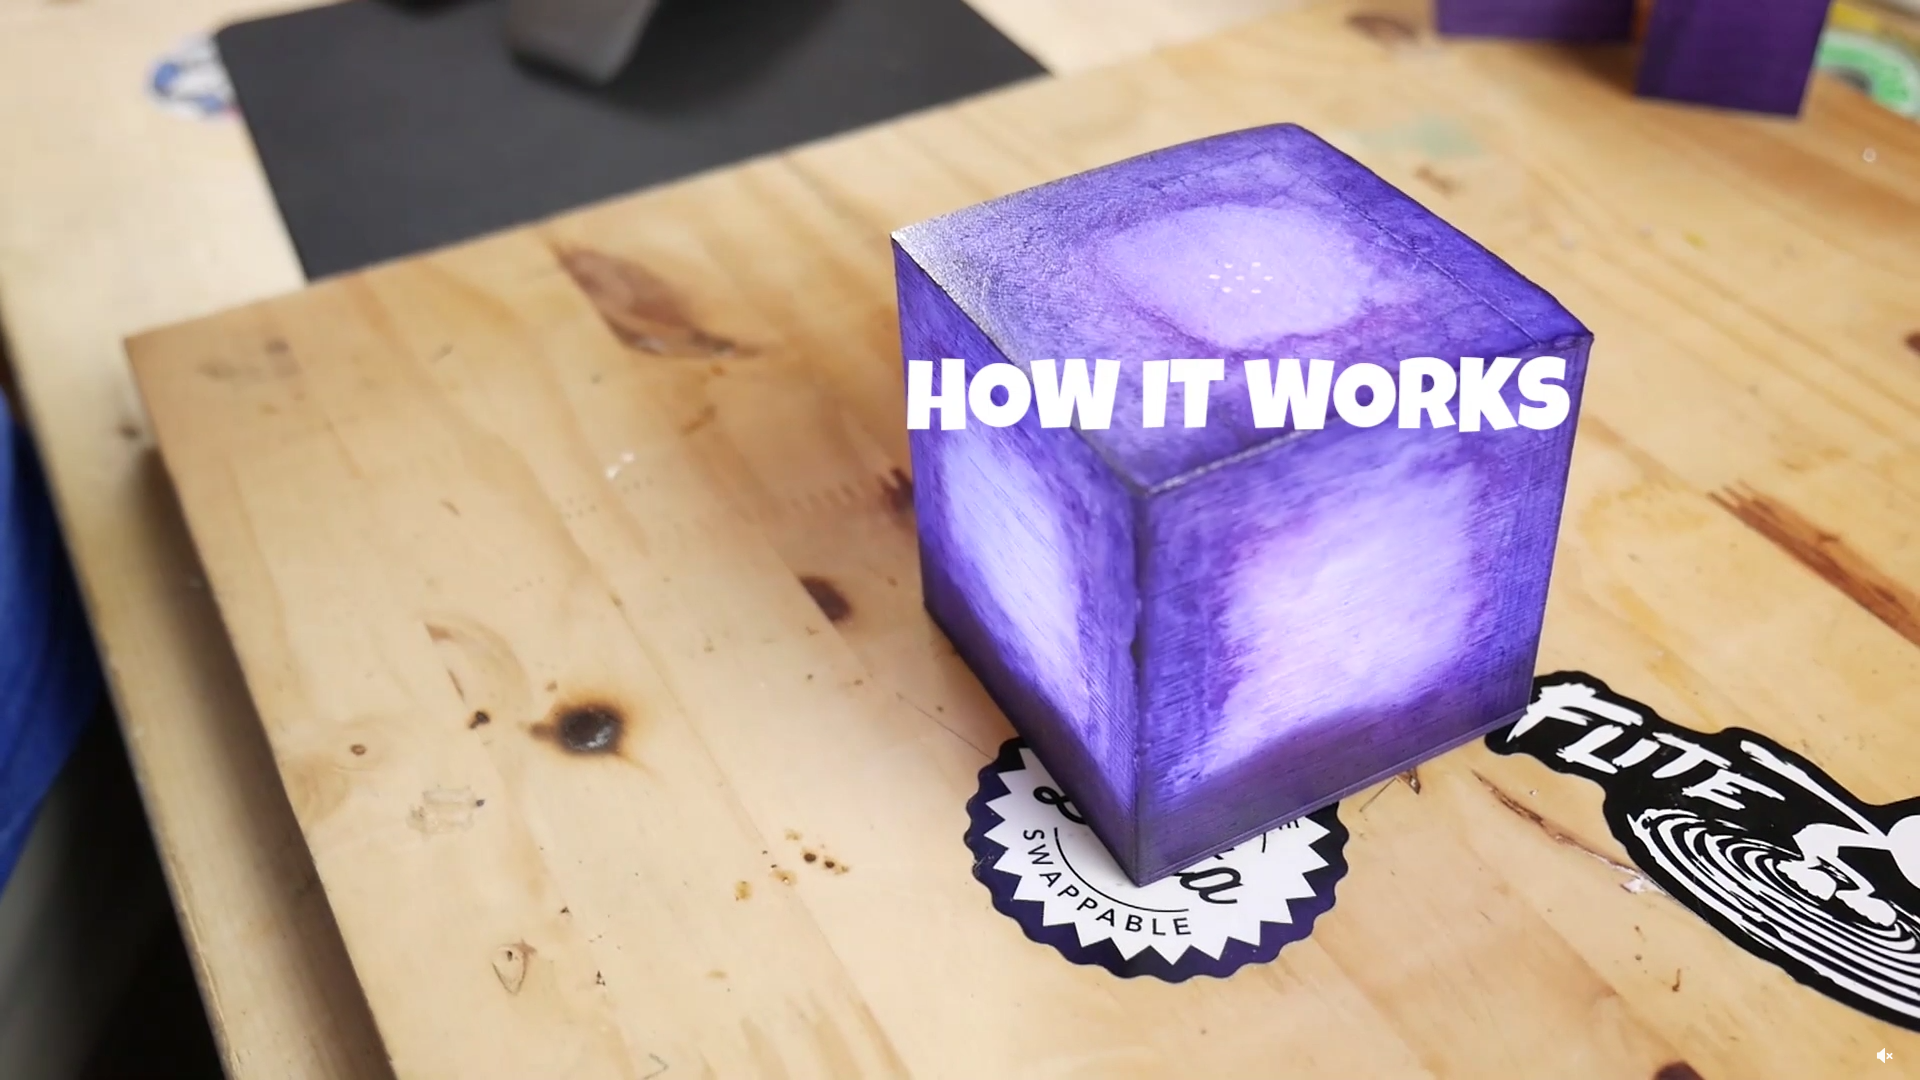 DIY Desktop Fortnite Battle Royale Cube Lights Up Dislikes Being 1920x1080